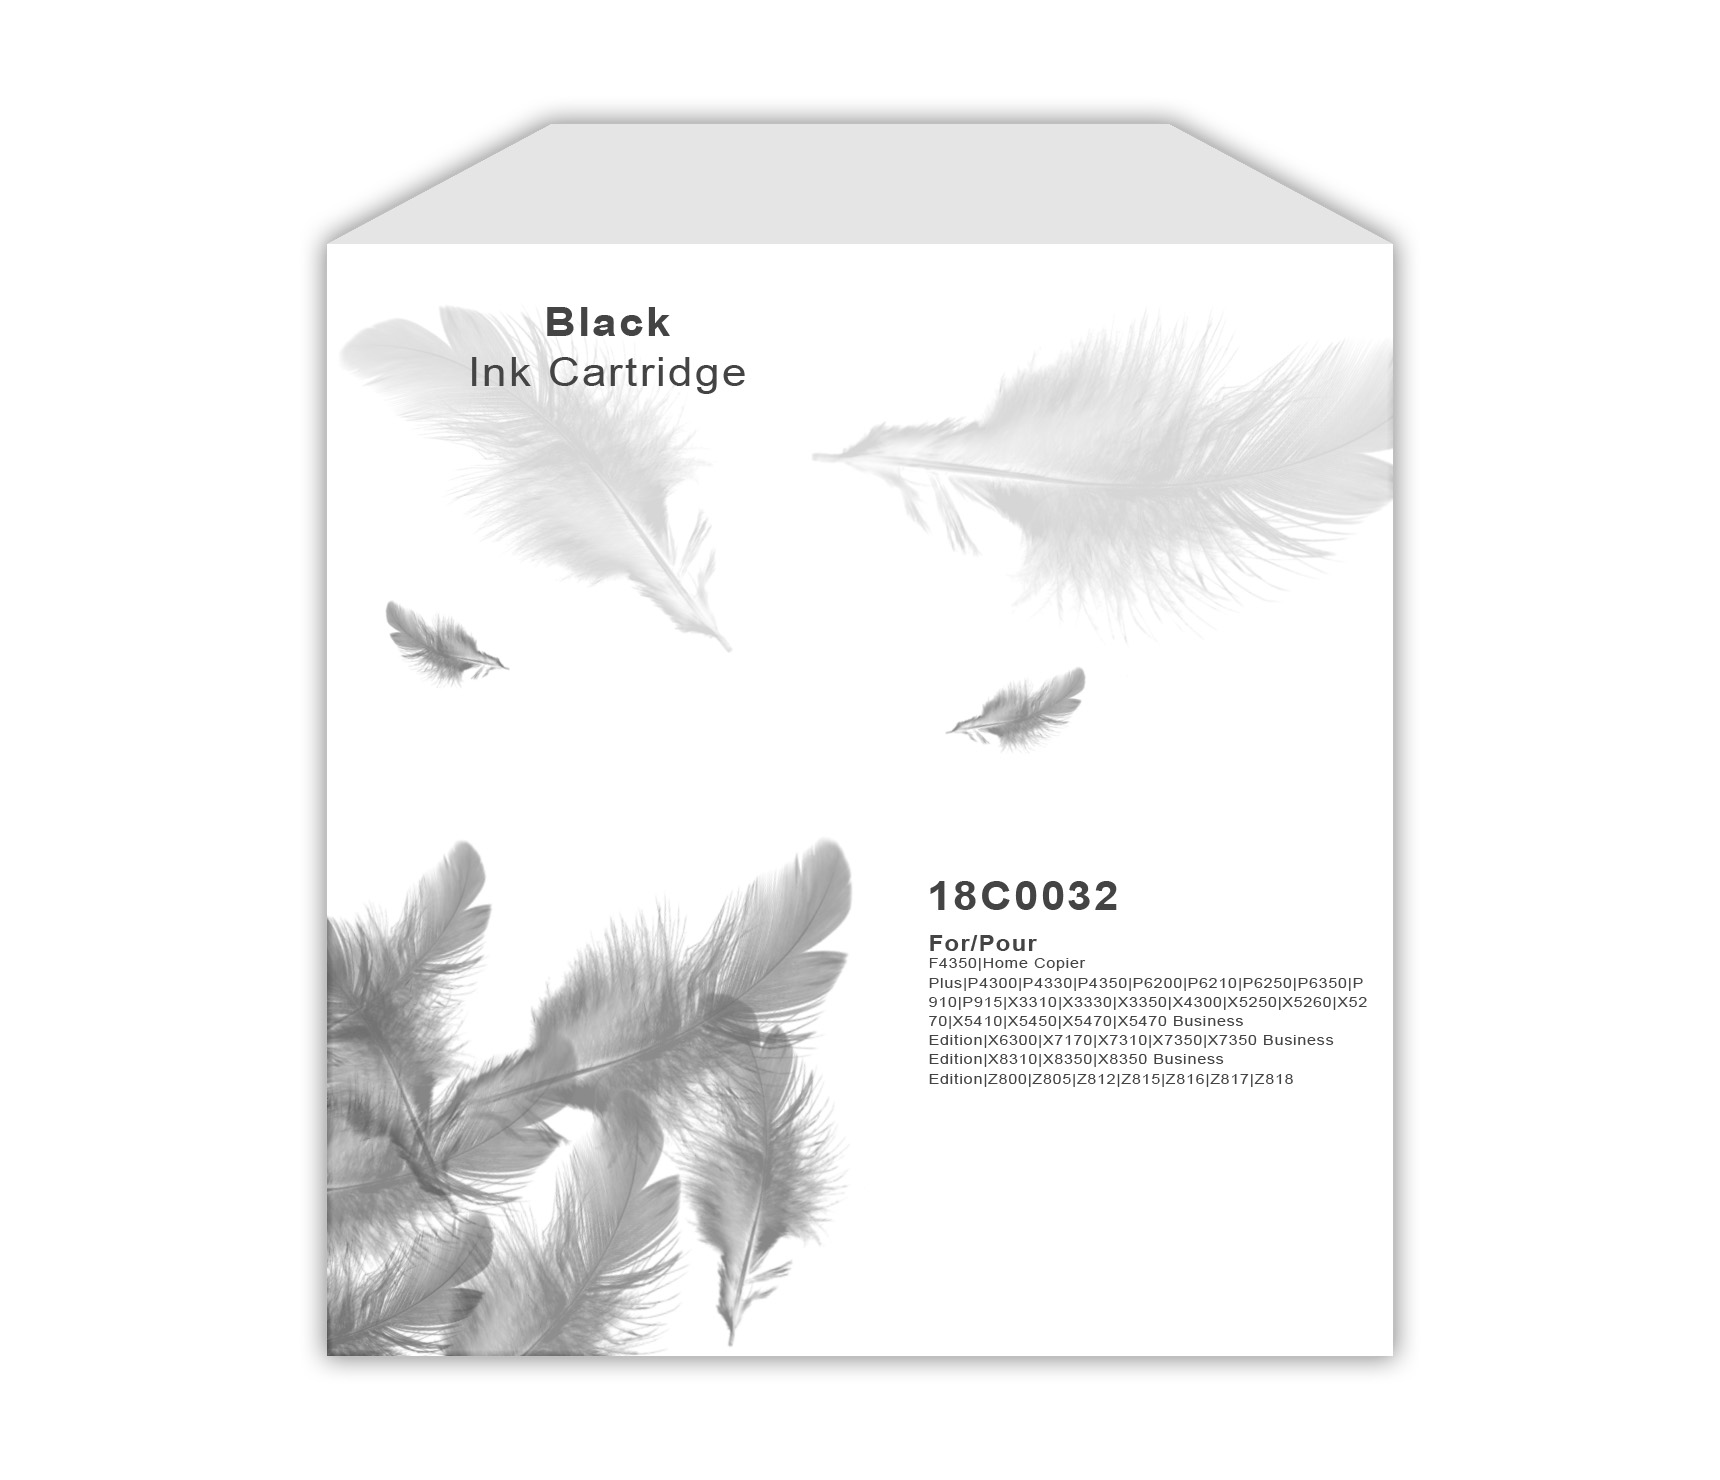 Lexmark No.32 Black Ink Cartridge